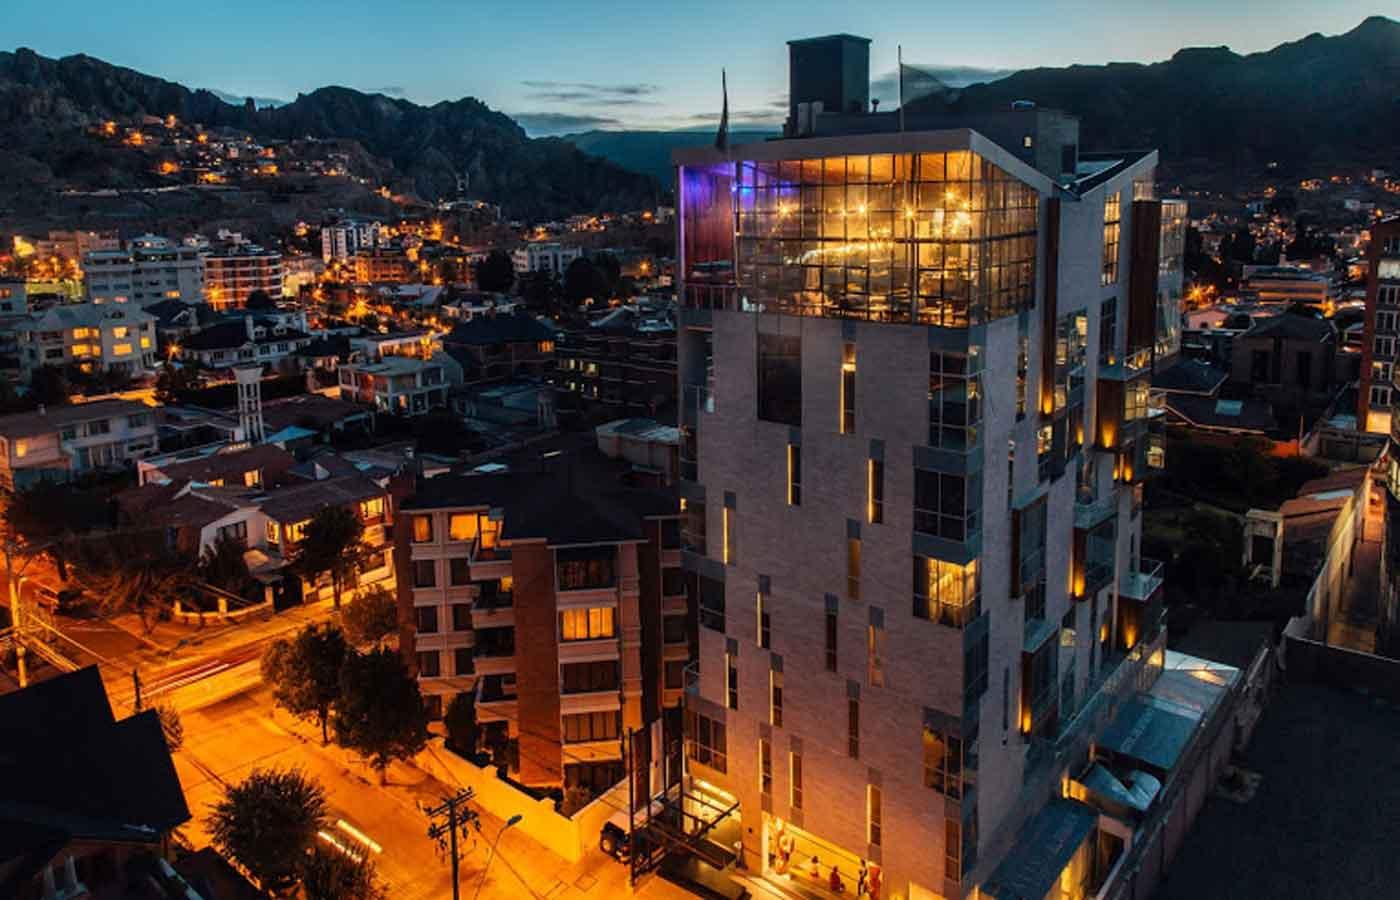 Hotel Atix, La Paz, Bolivia